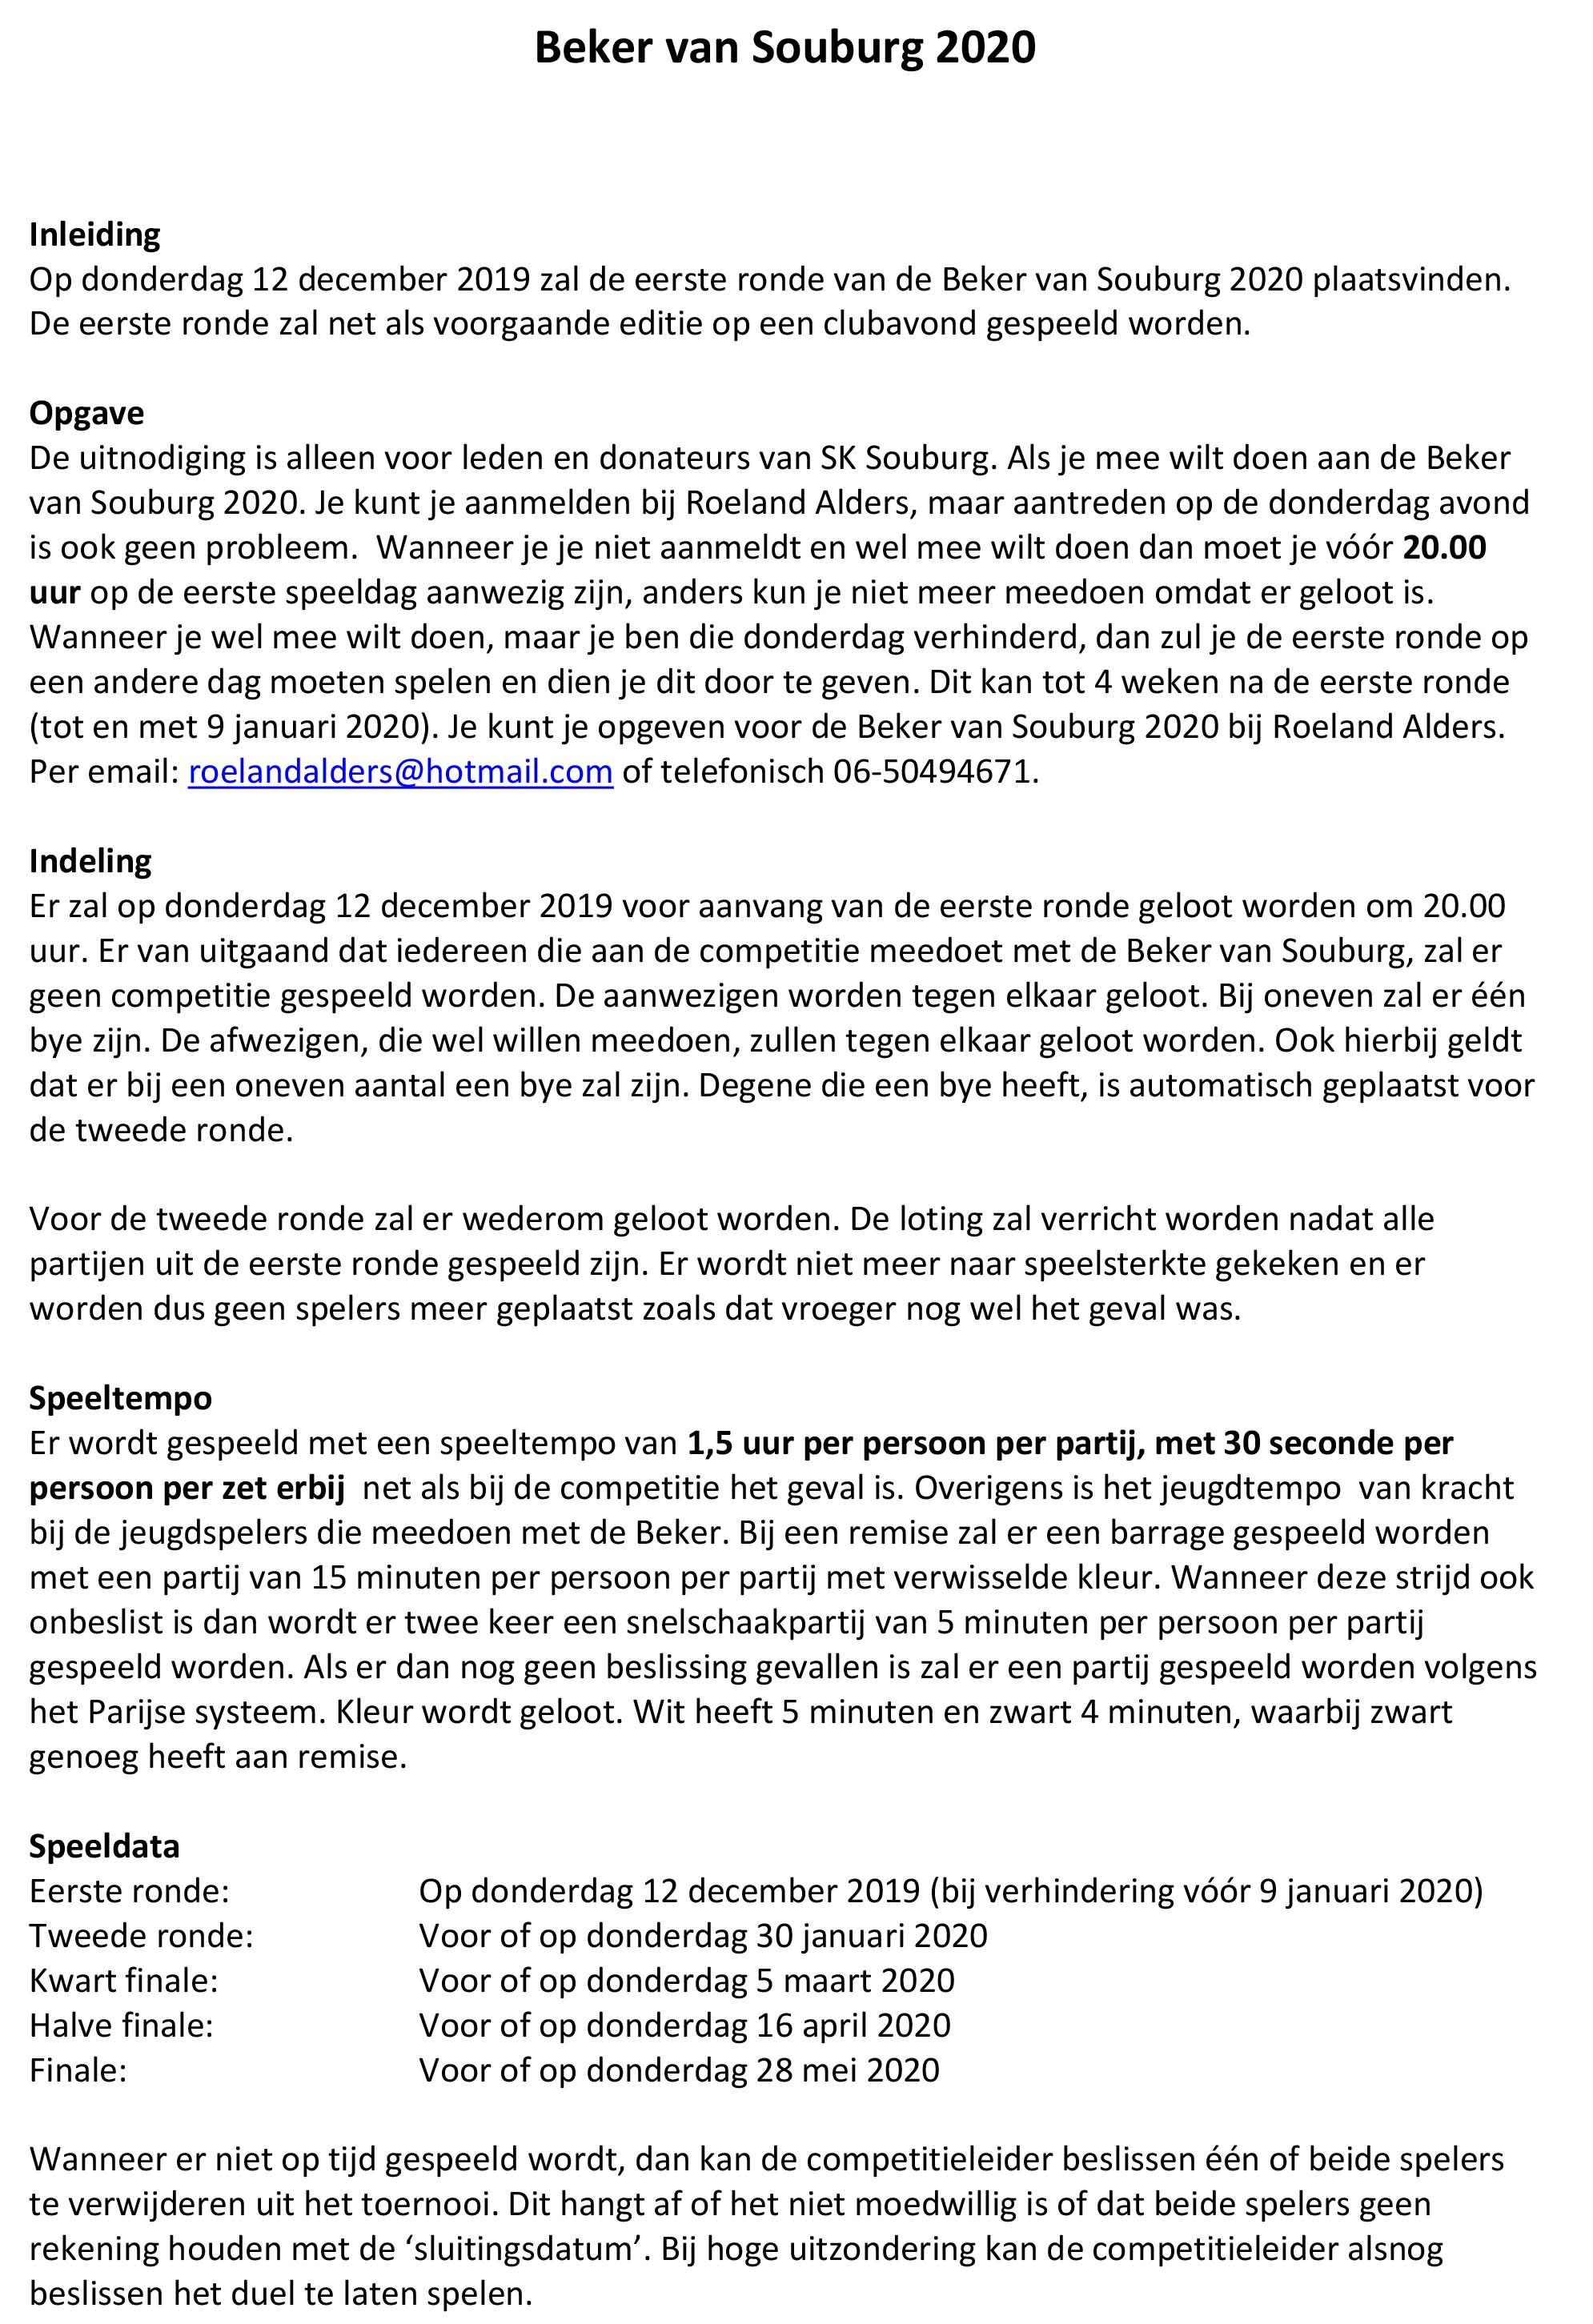 Uitnodiging Beker van Souburg 2020